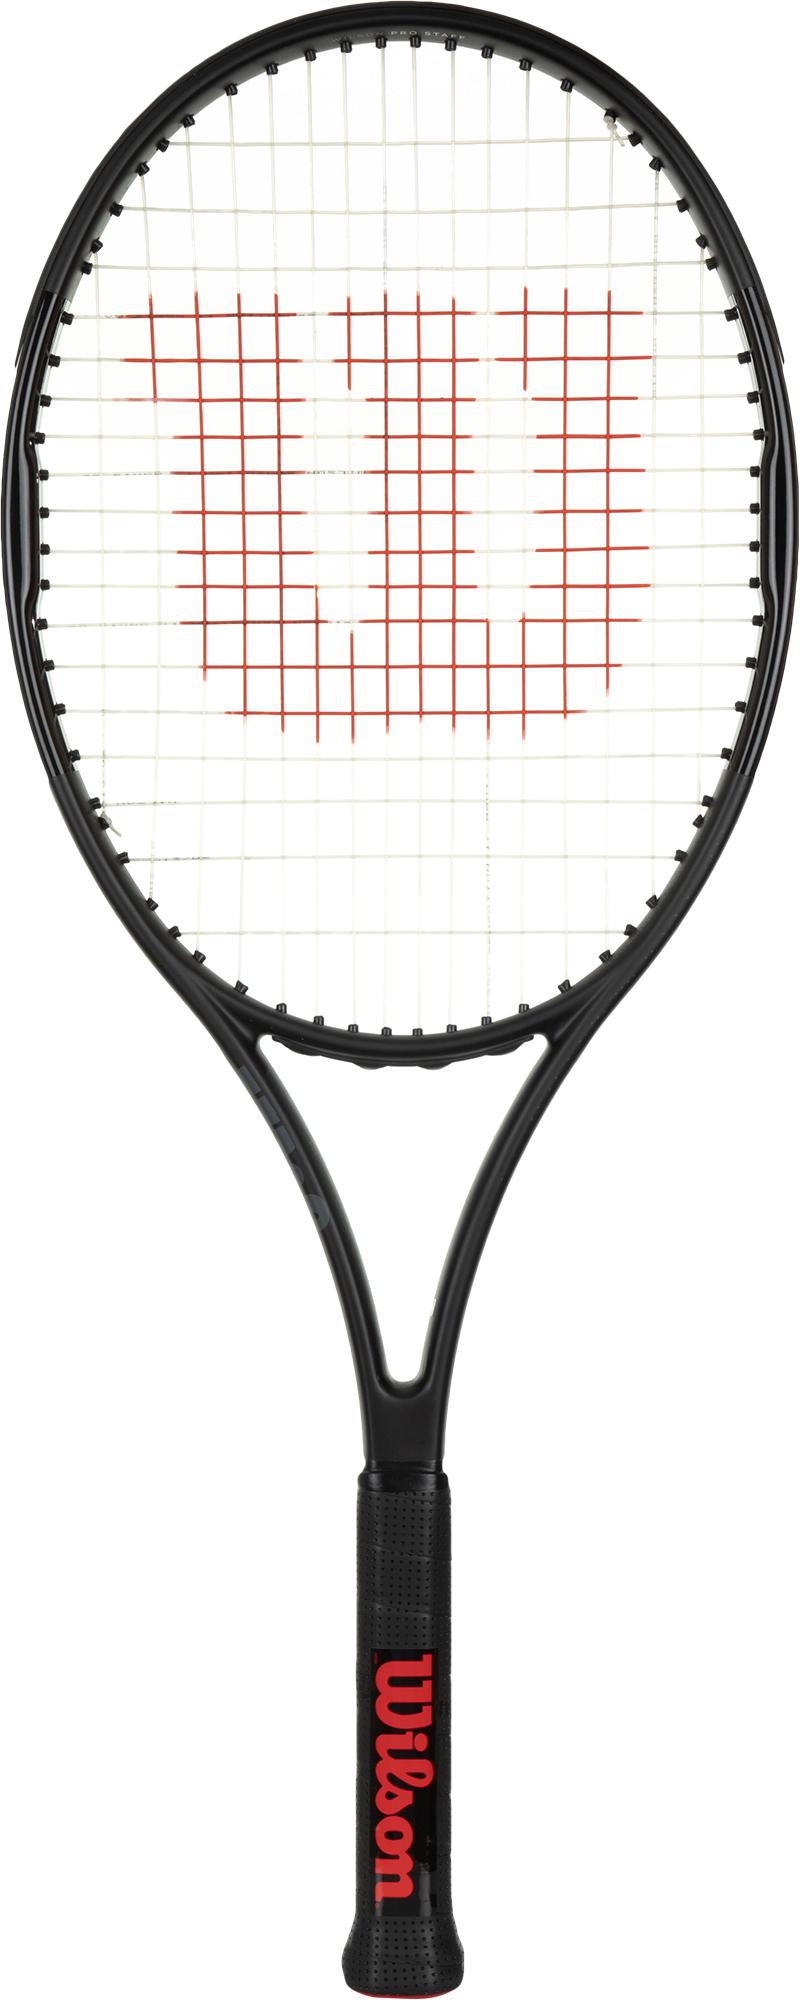 Wilson Ракетка для большого тенниса Wilson PRO STAFF 26, размер Без размера wilson набор мячей для большого тенниса wilson us open x3 размер без размера